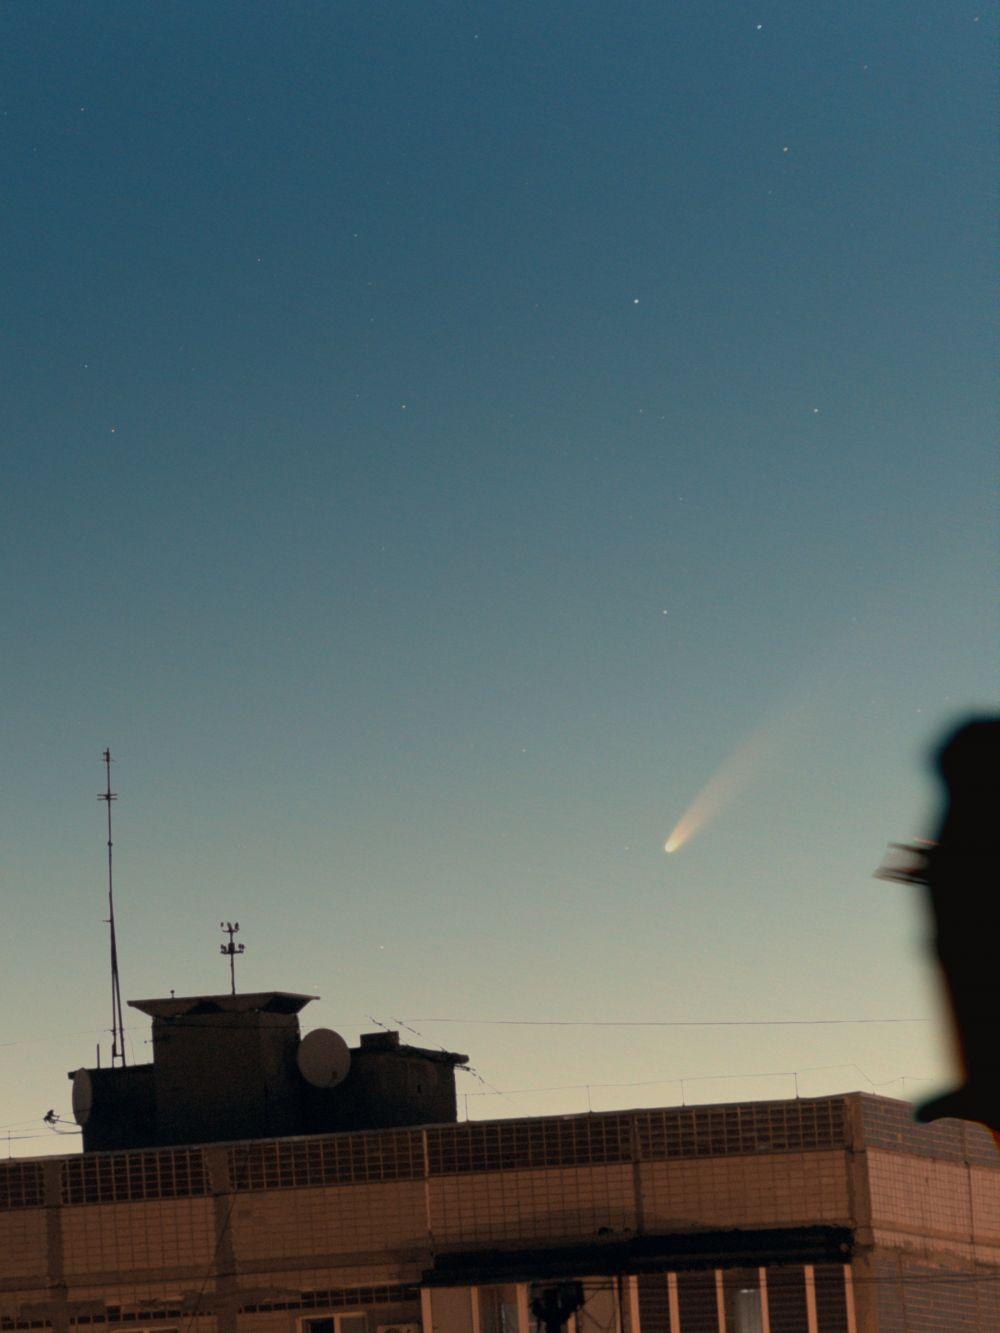 Evening comet C/2020 F3 (NEOWISE) 11.07.2020